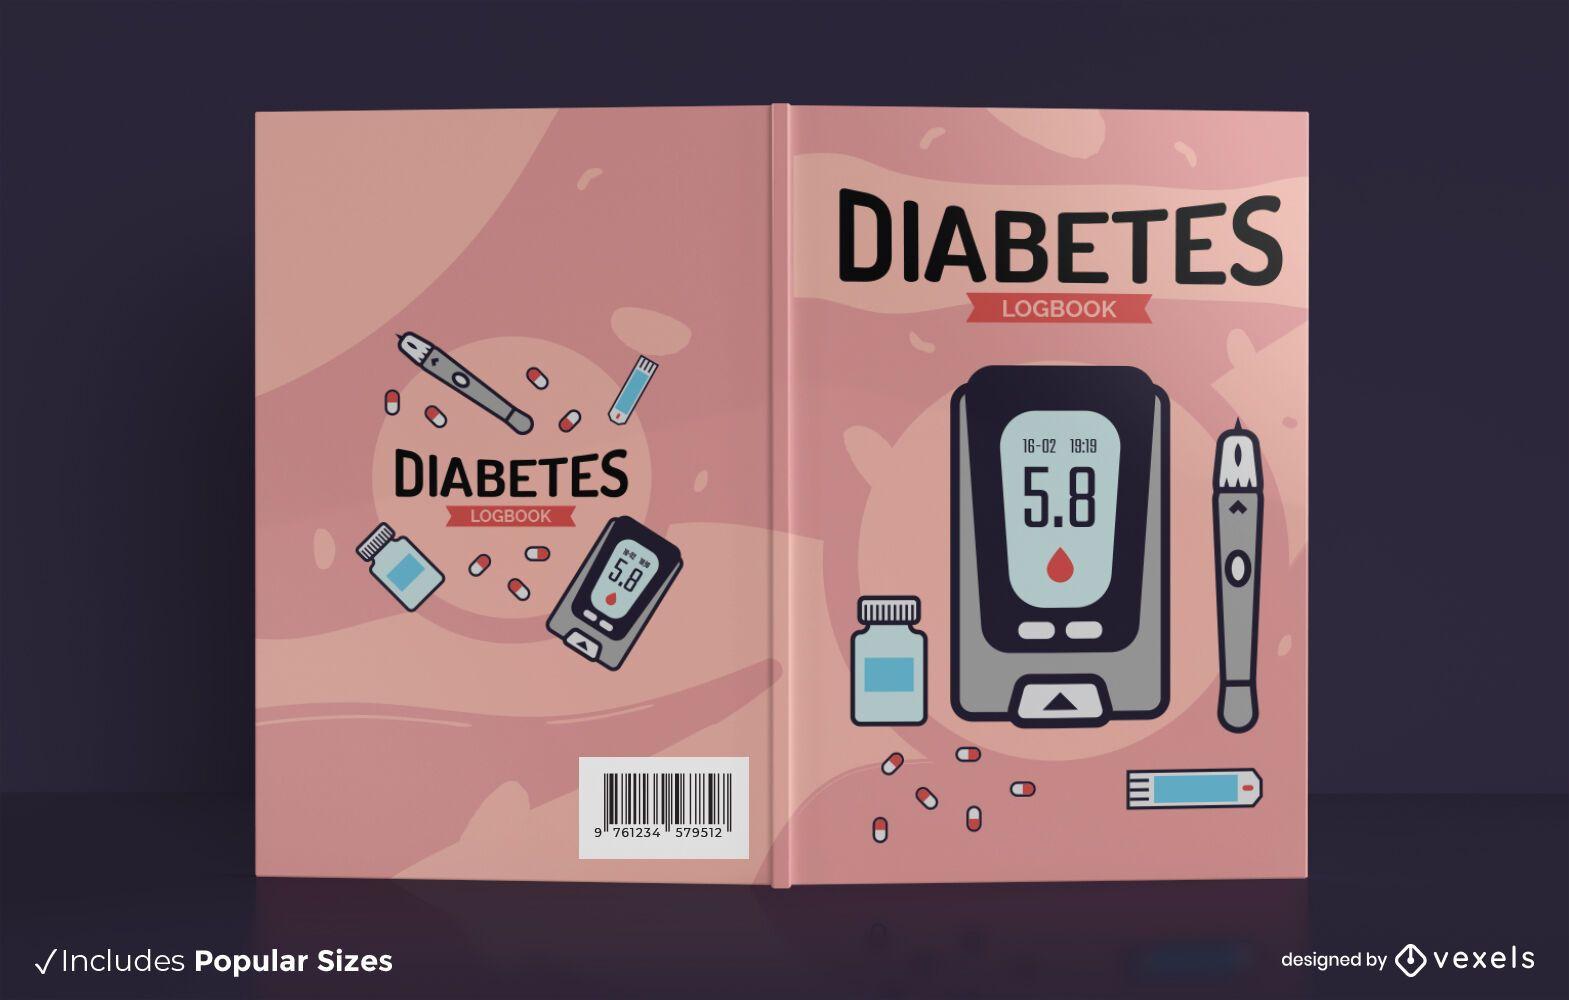 Diabetes Log Gesundheitsbuch Cover Design